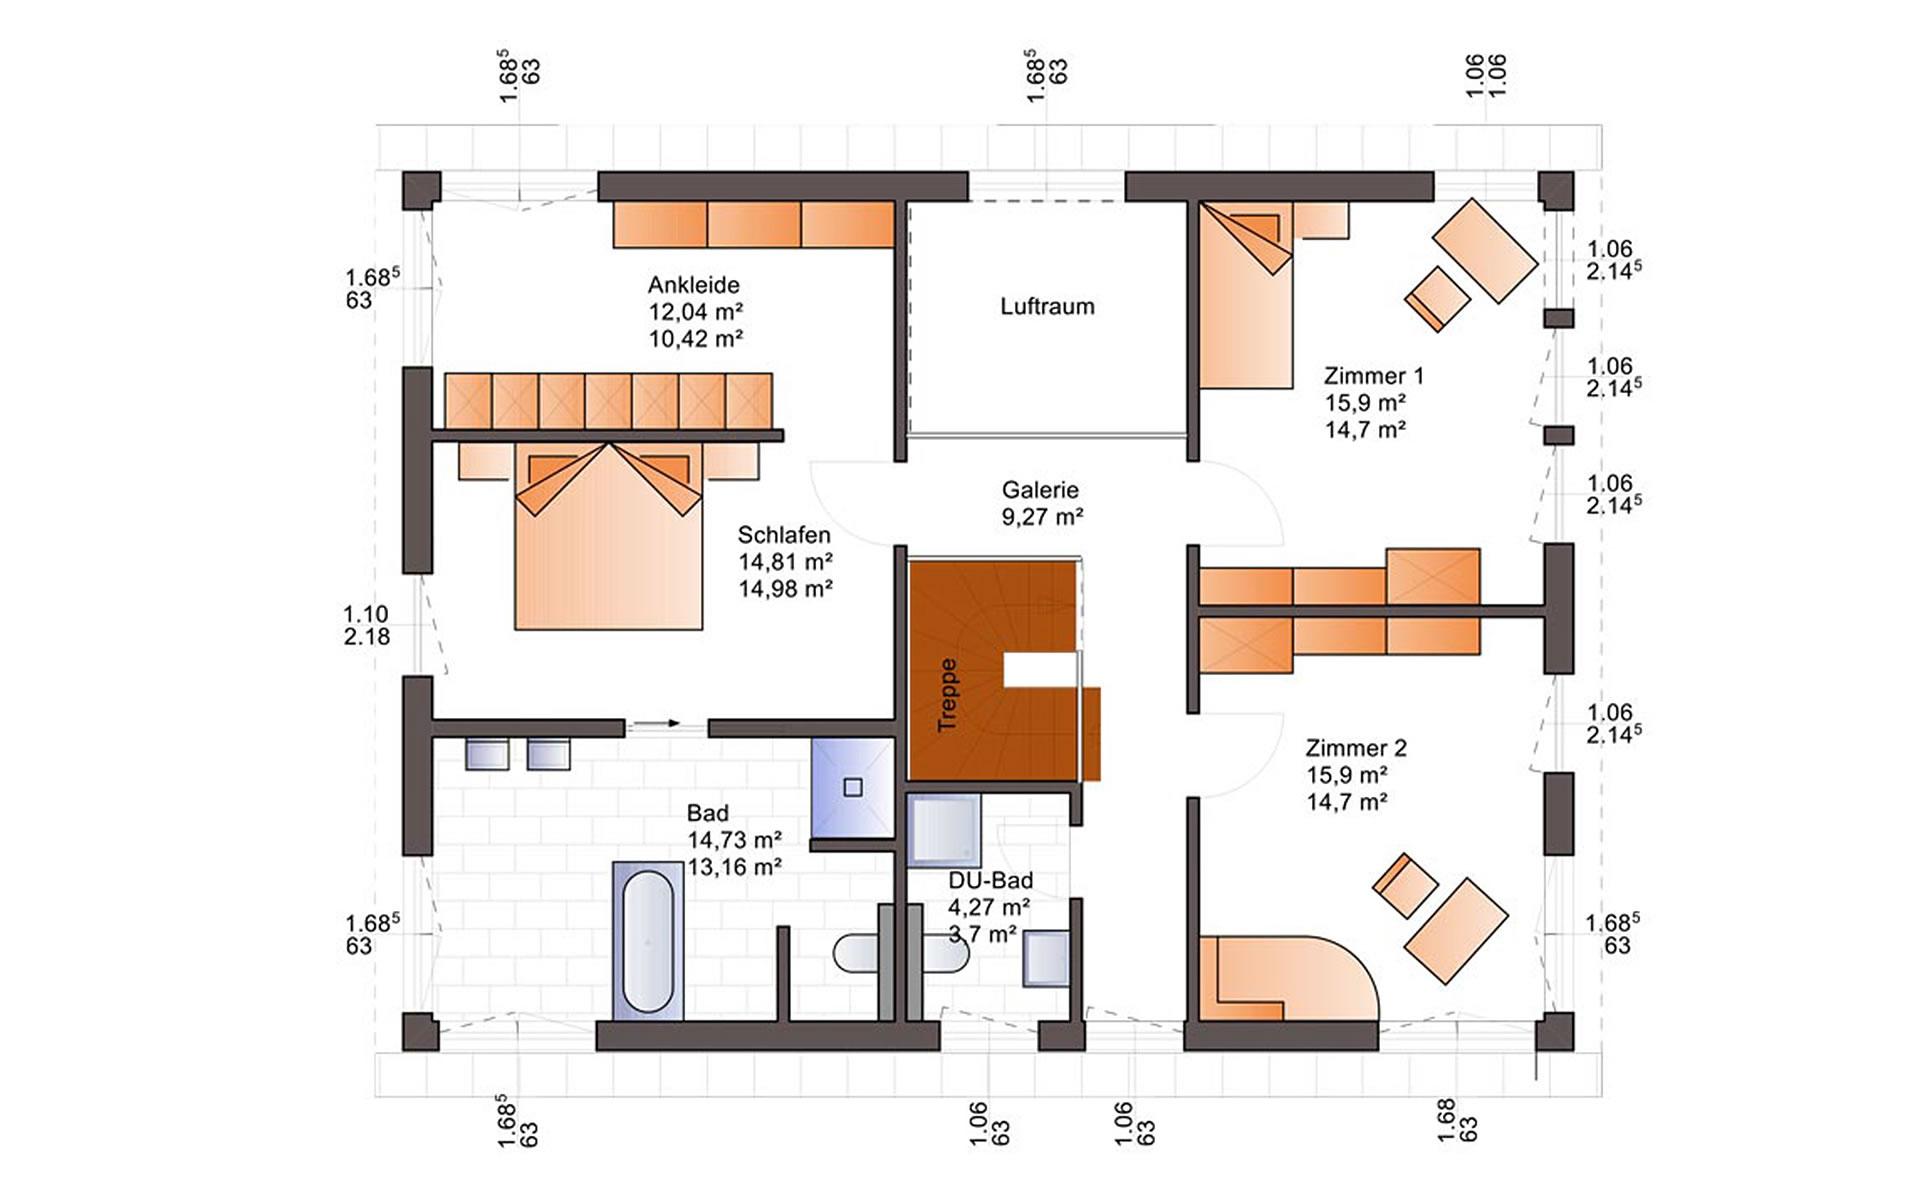 Dachgeschoss Esprit 184 von Bärenhaus - das fertige Haus GmbH